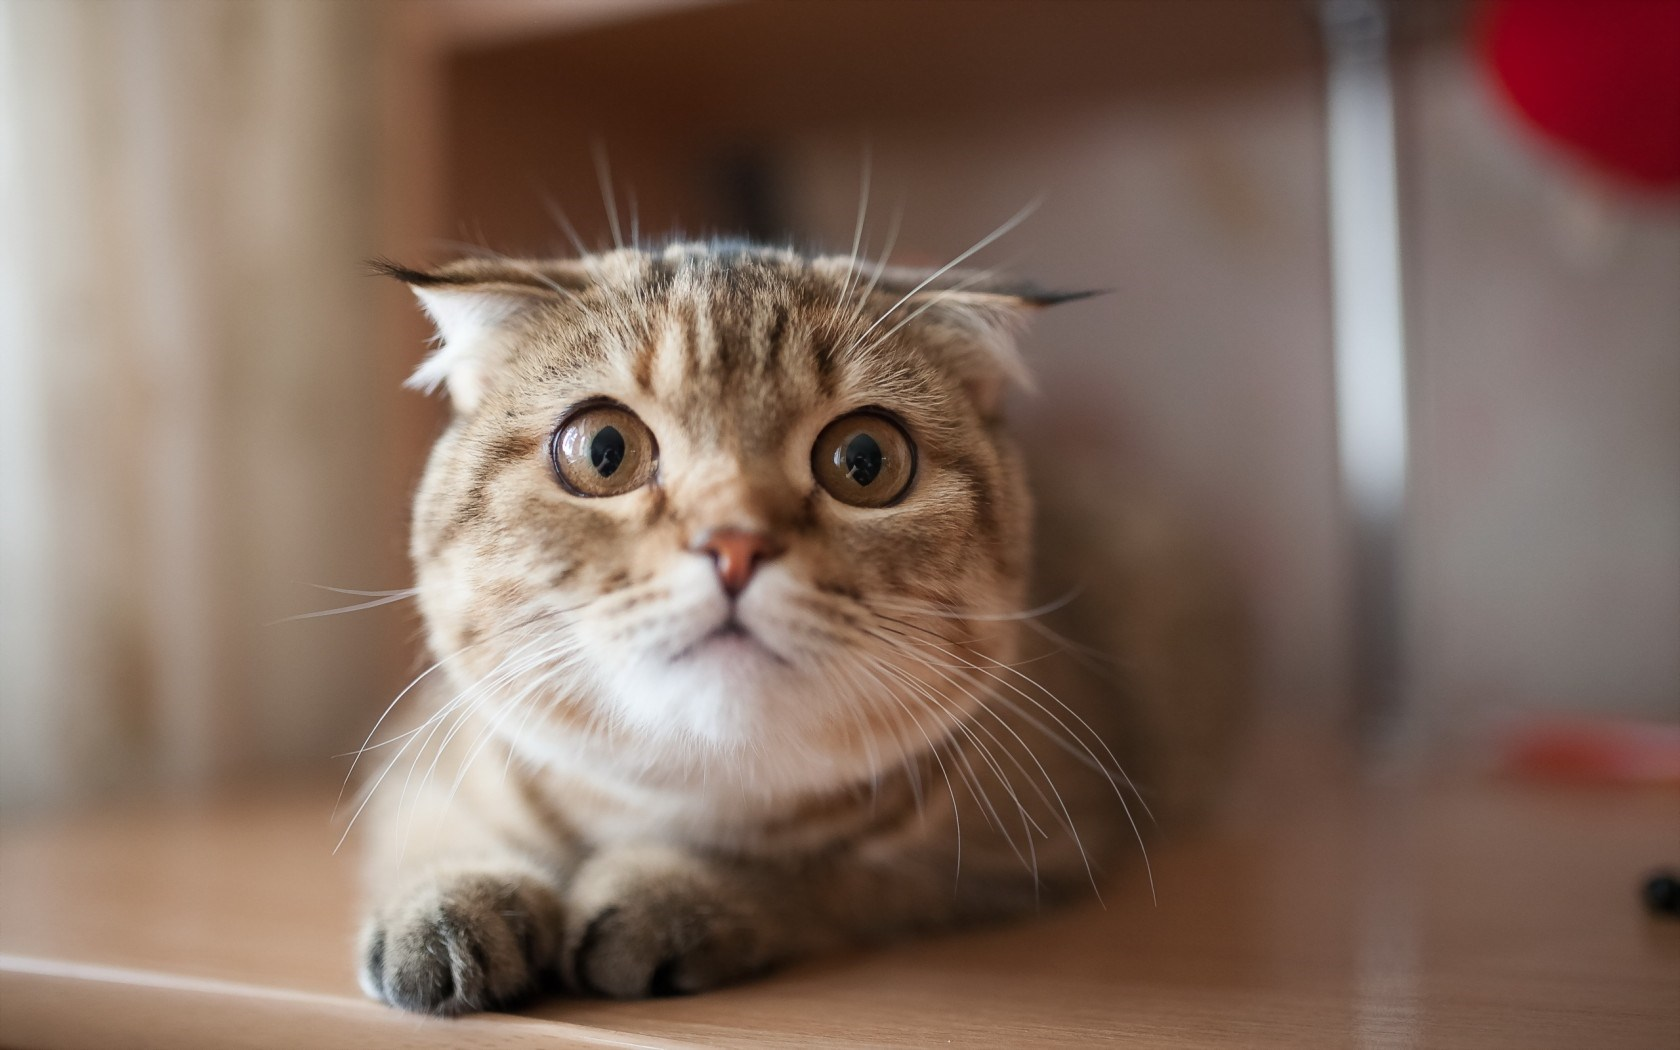 adorable cat look wallpaper 44164